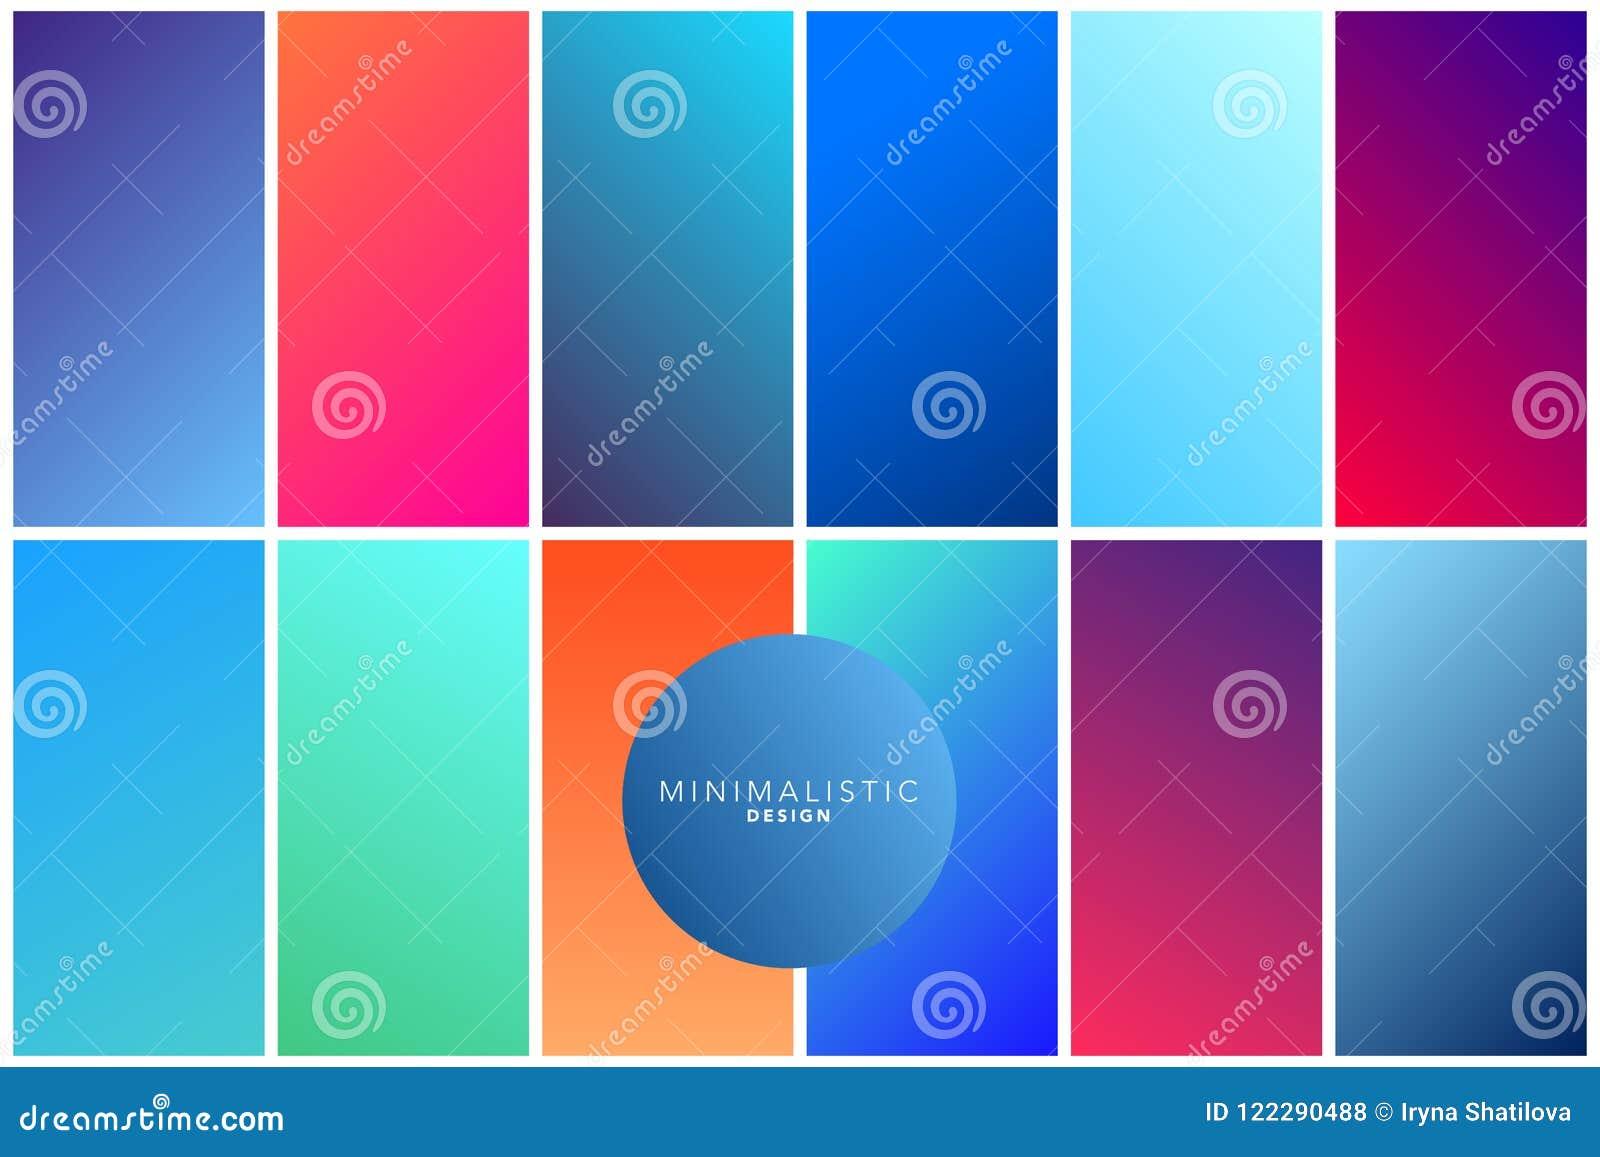 Minimal Geometric Background  Stock Vector - Illustration of